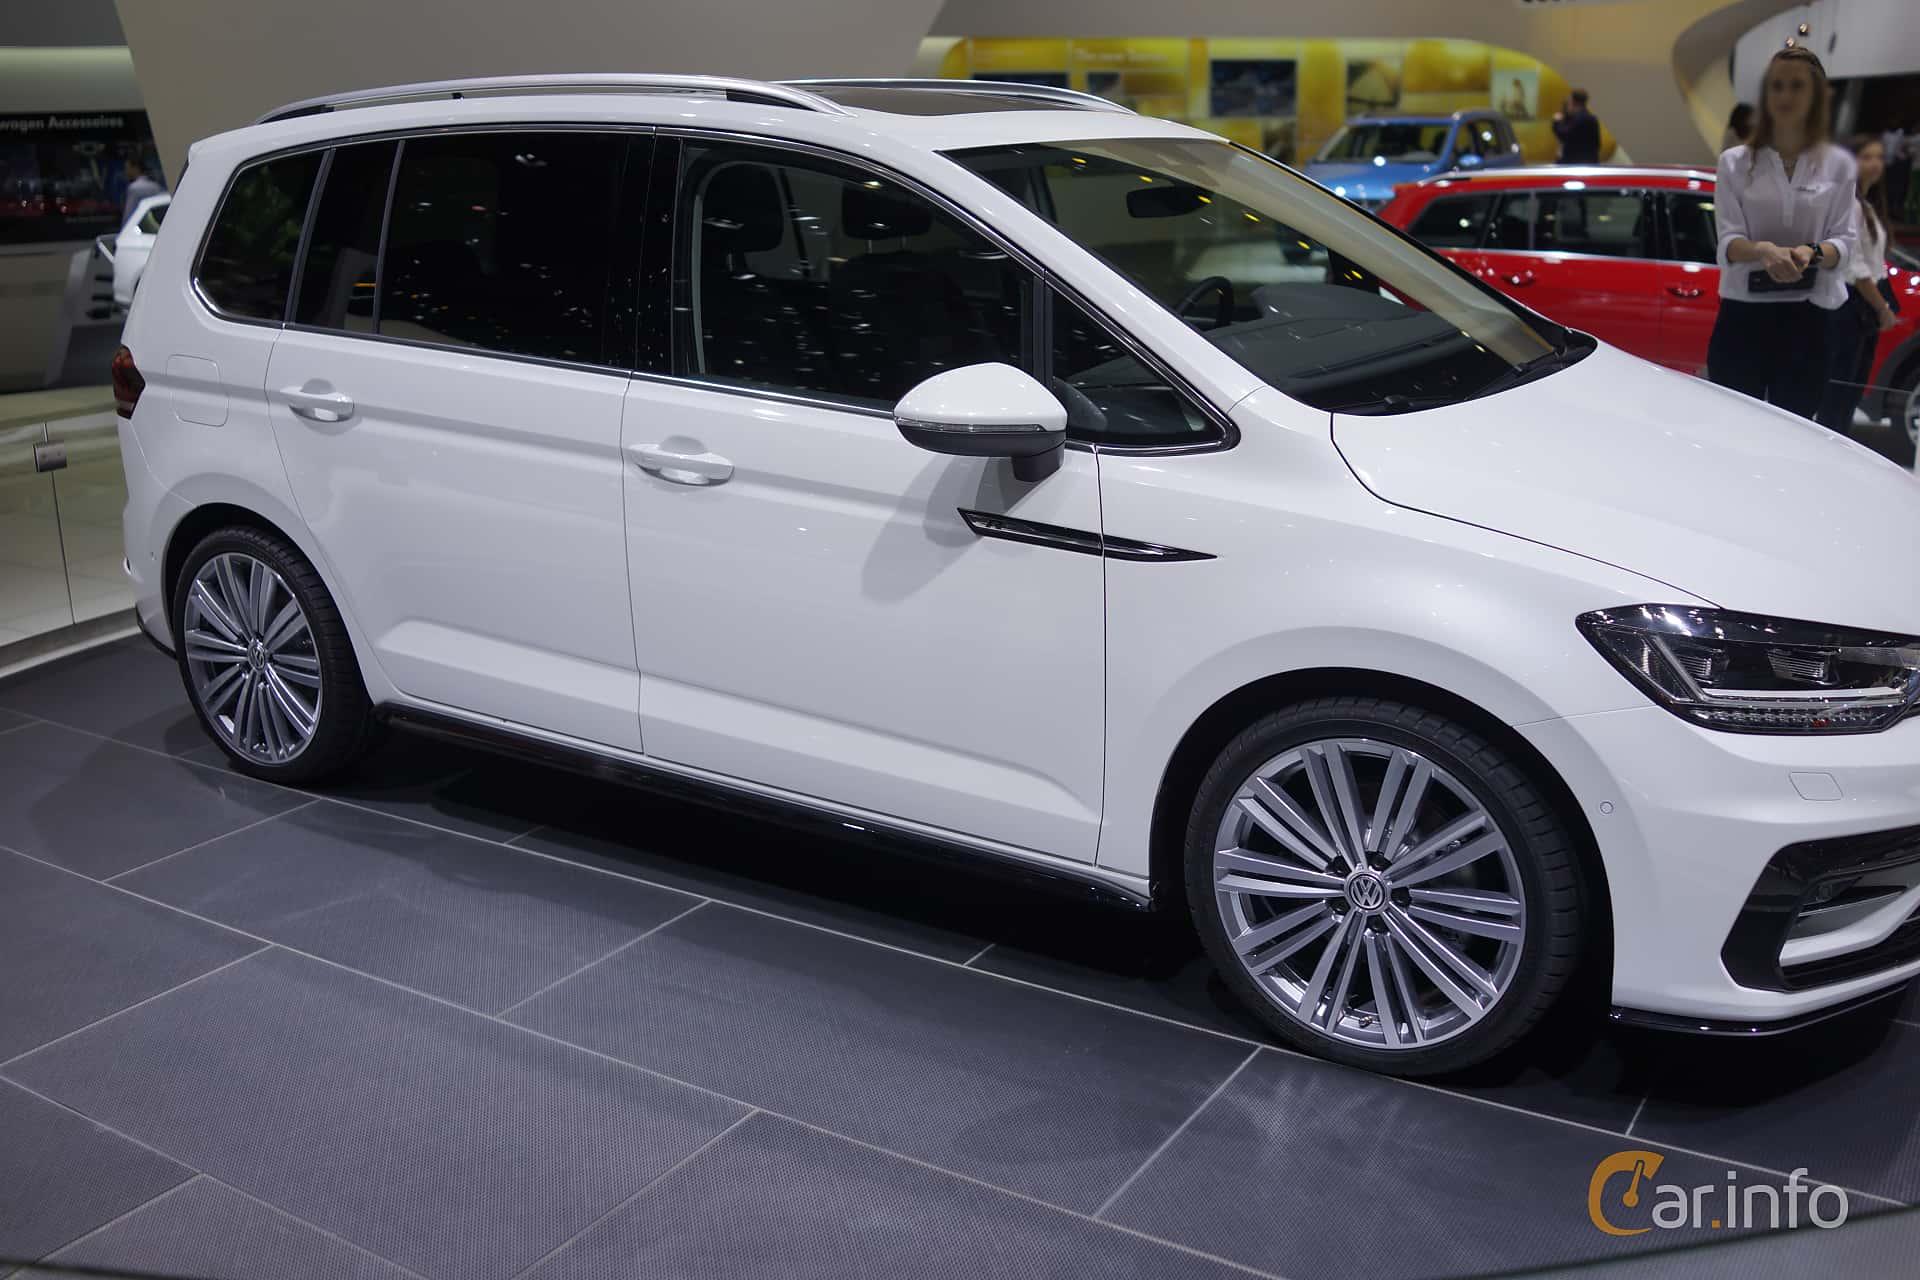 Volkswagen Touran 20 Tdi 150hp 2016 Exterior Light Control Wiring System